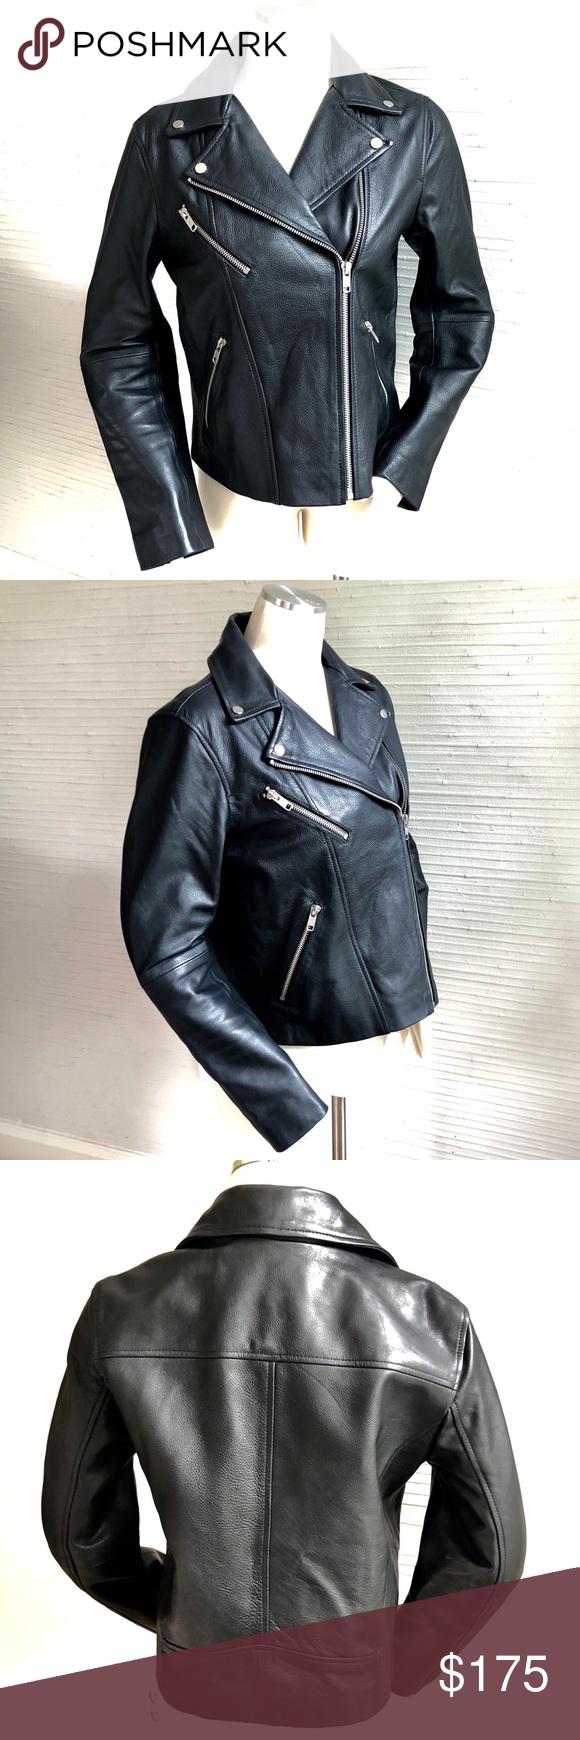 H M Leather Moto Jacket Current Season Size 6 Leather Moto Jacket Jackets Clothes Design [ 1740 x 580 Pixel ]